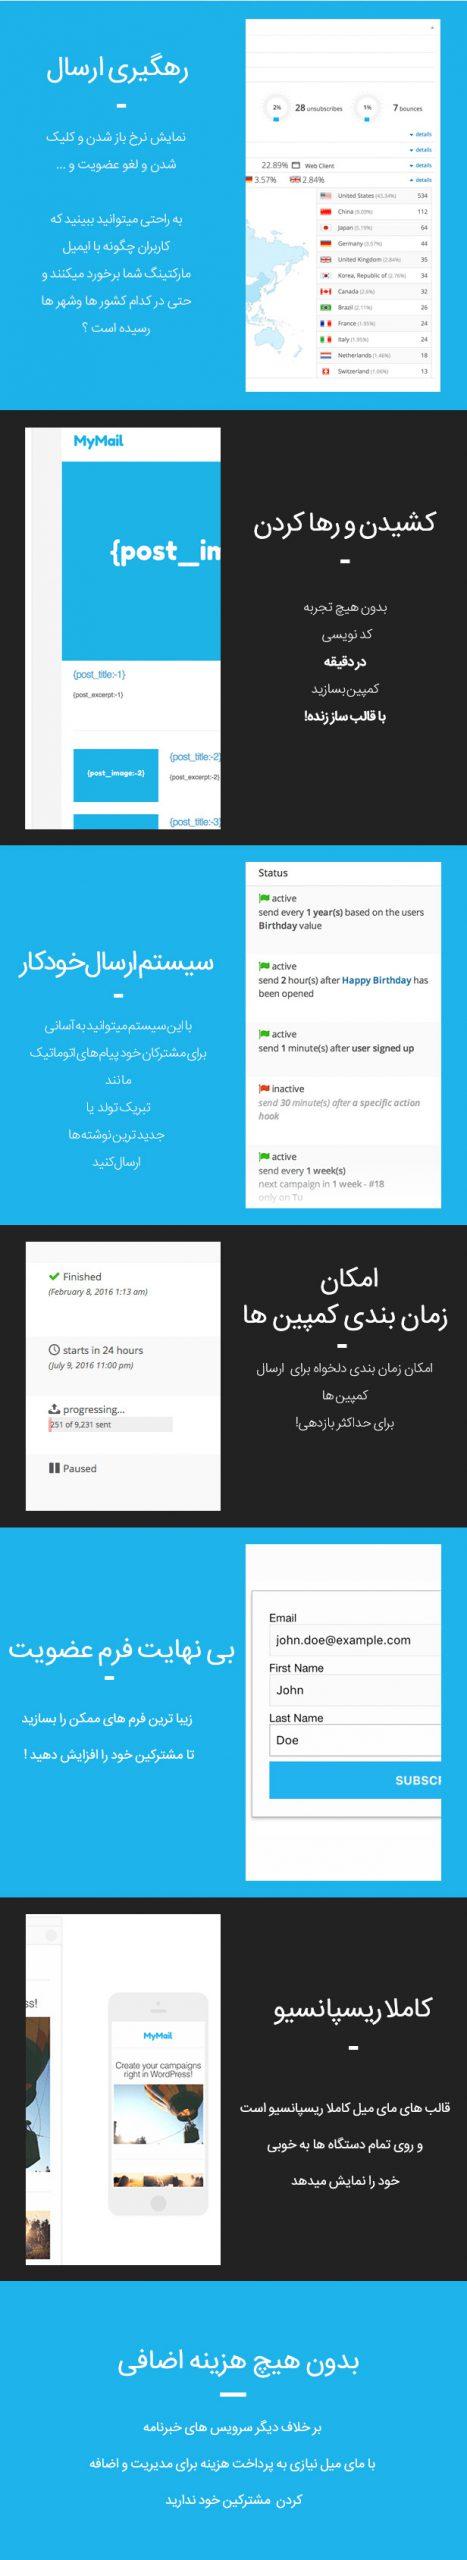 MyMail فارسی | خبرنامه فوق حرفه ای وردپرس | Mailster افزونه ایمیل مارکتینگ وردپرس